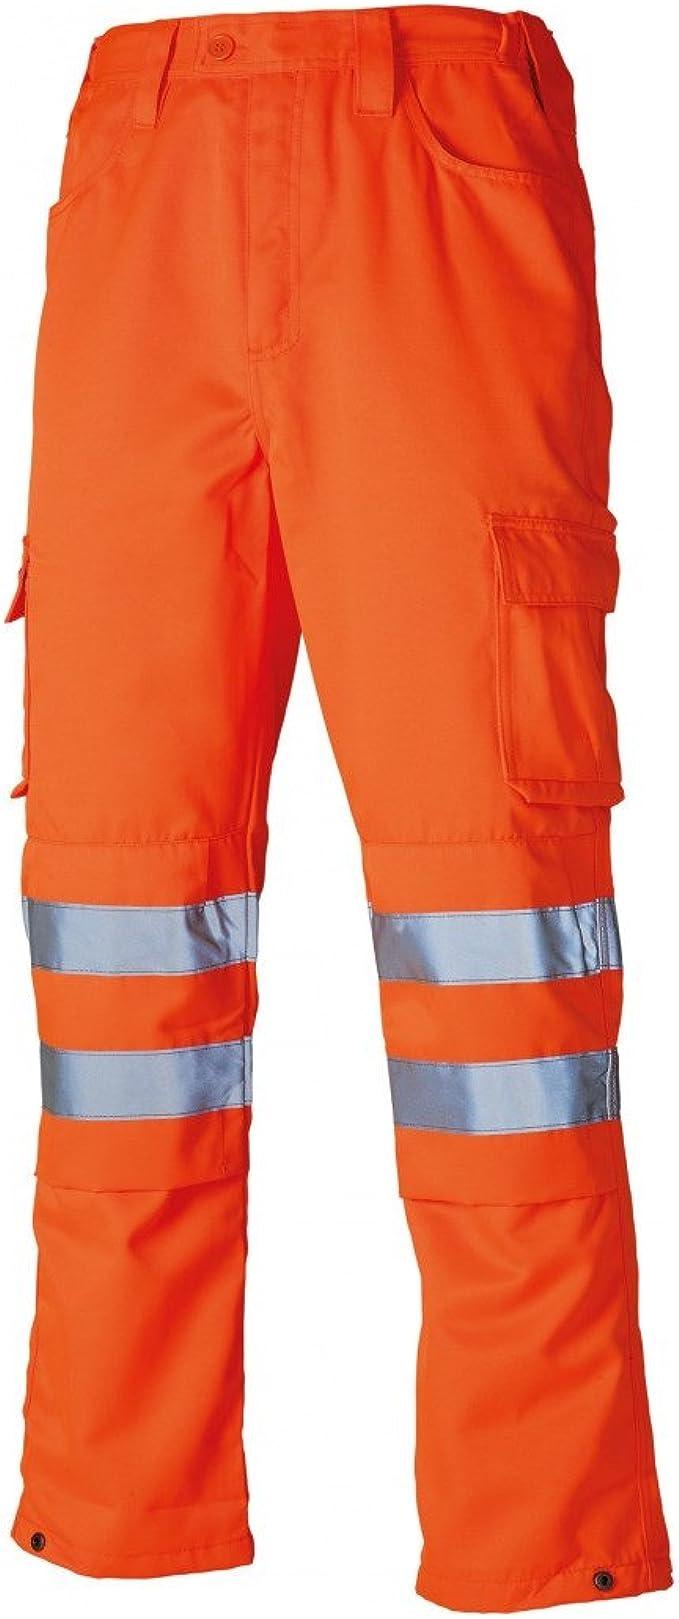 "COSALT HI VIS ORANGE Polycotton Work Trousers Combats Highways Railway GO//RT 32/"""